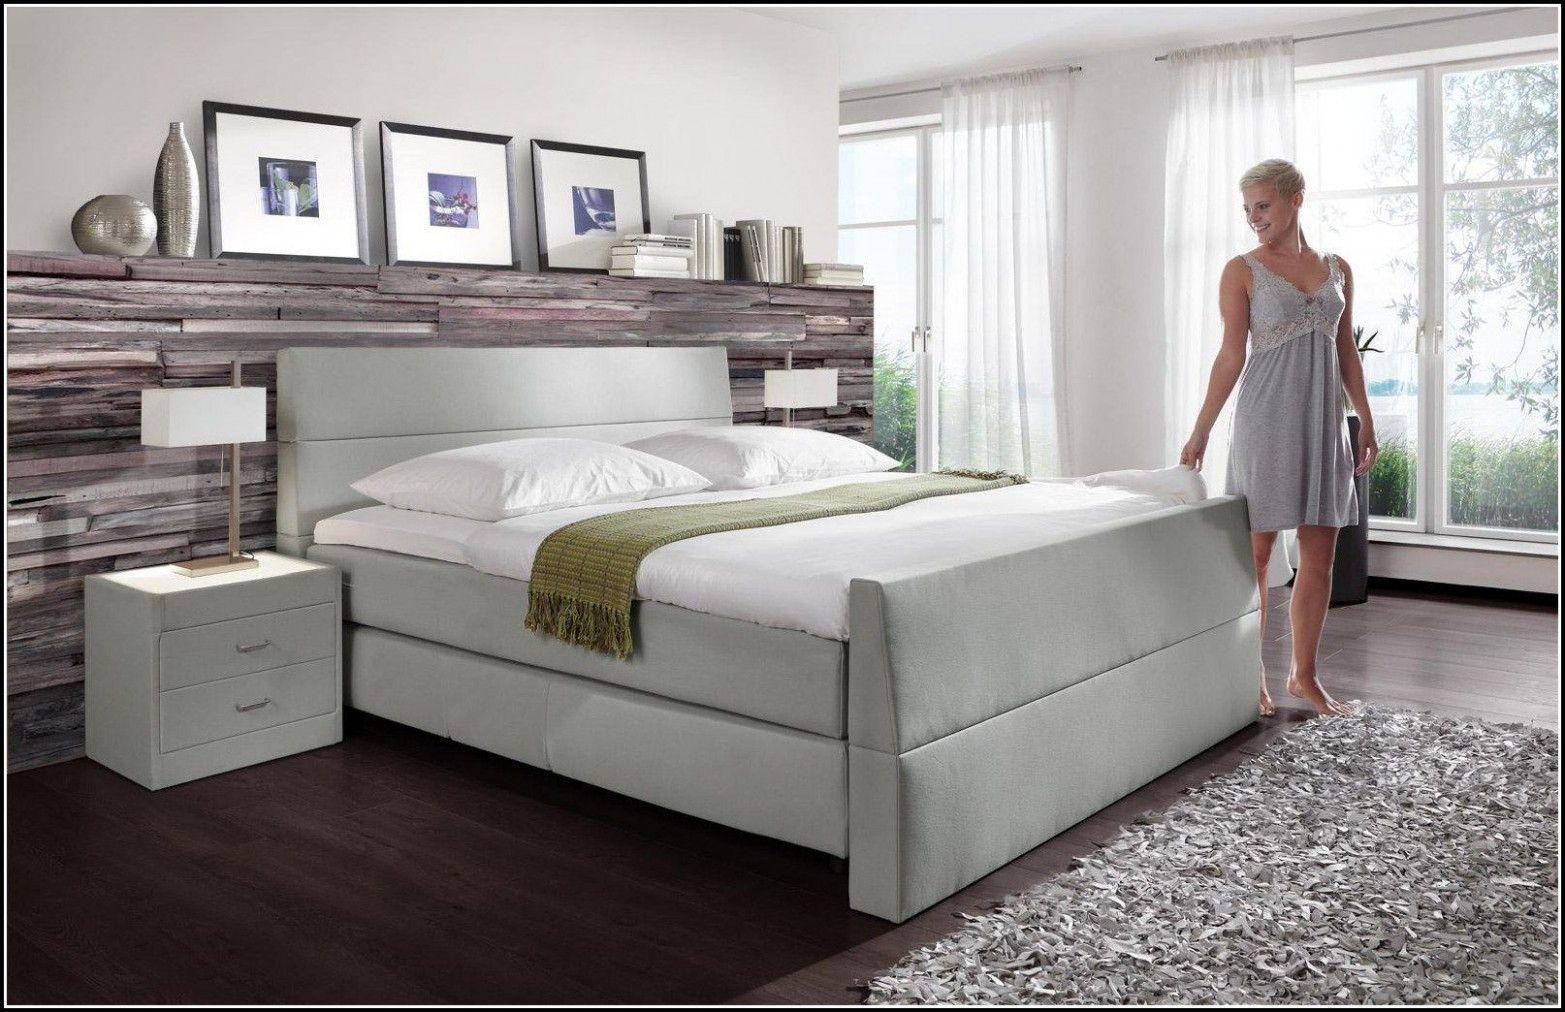 Schlafzimmer Ideen Boxspringbett